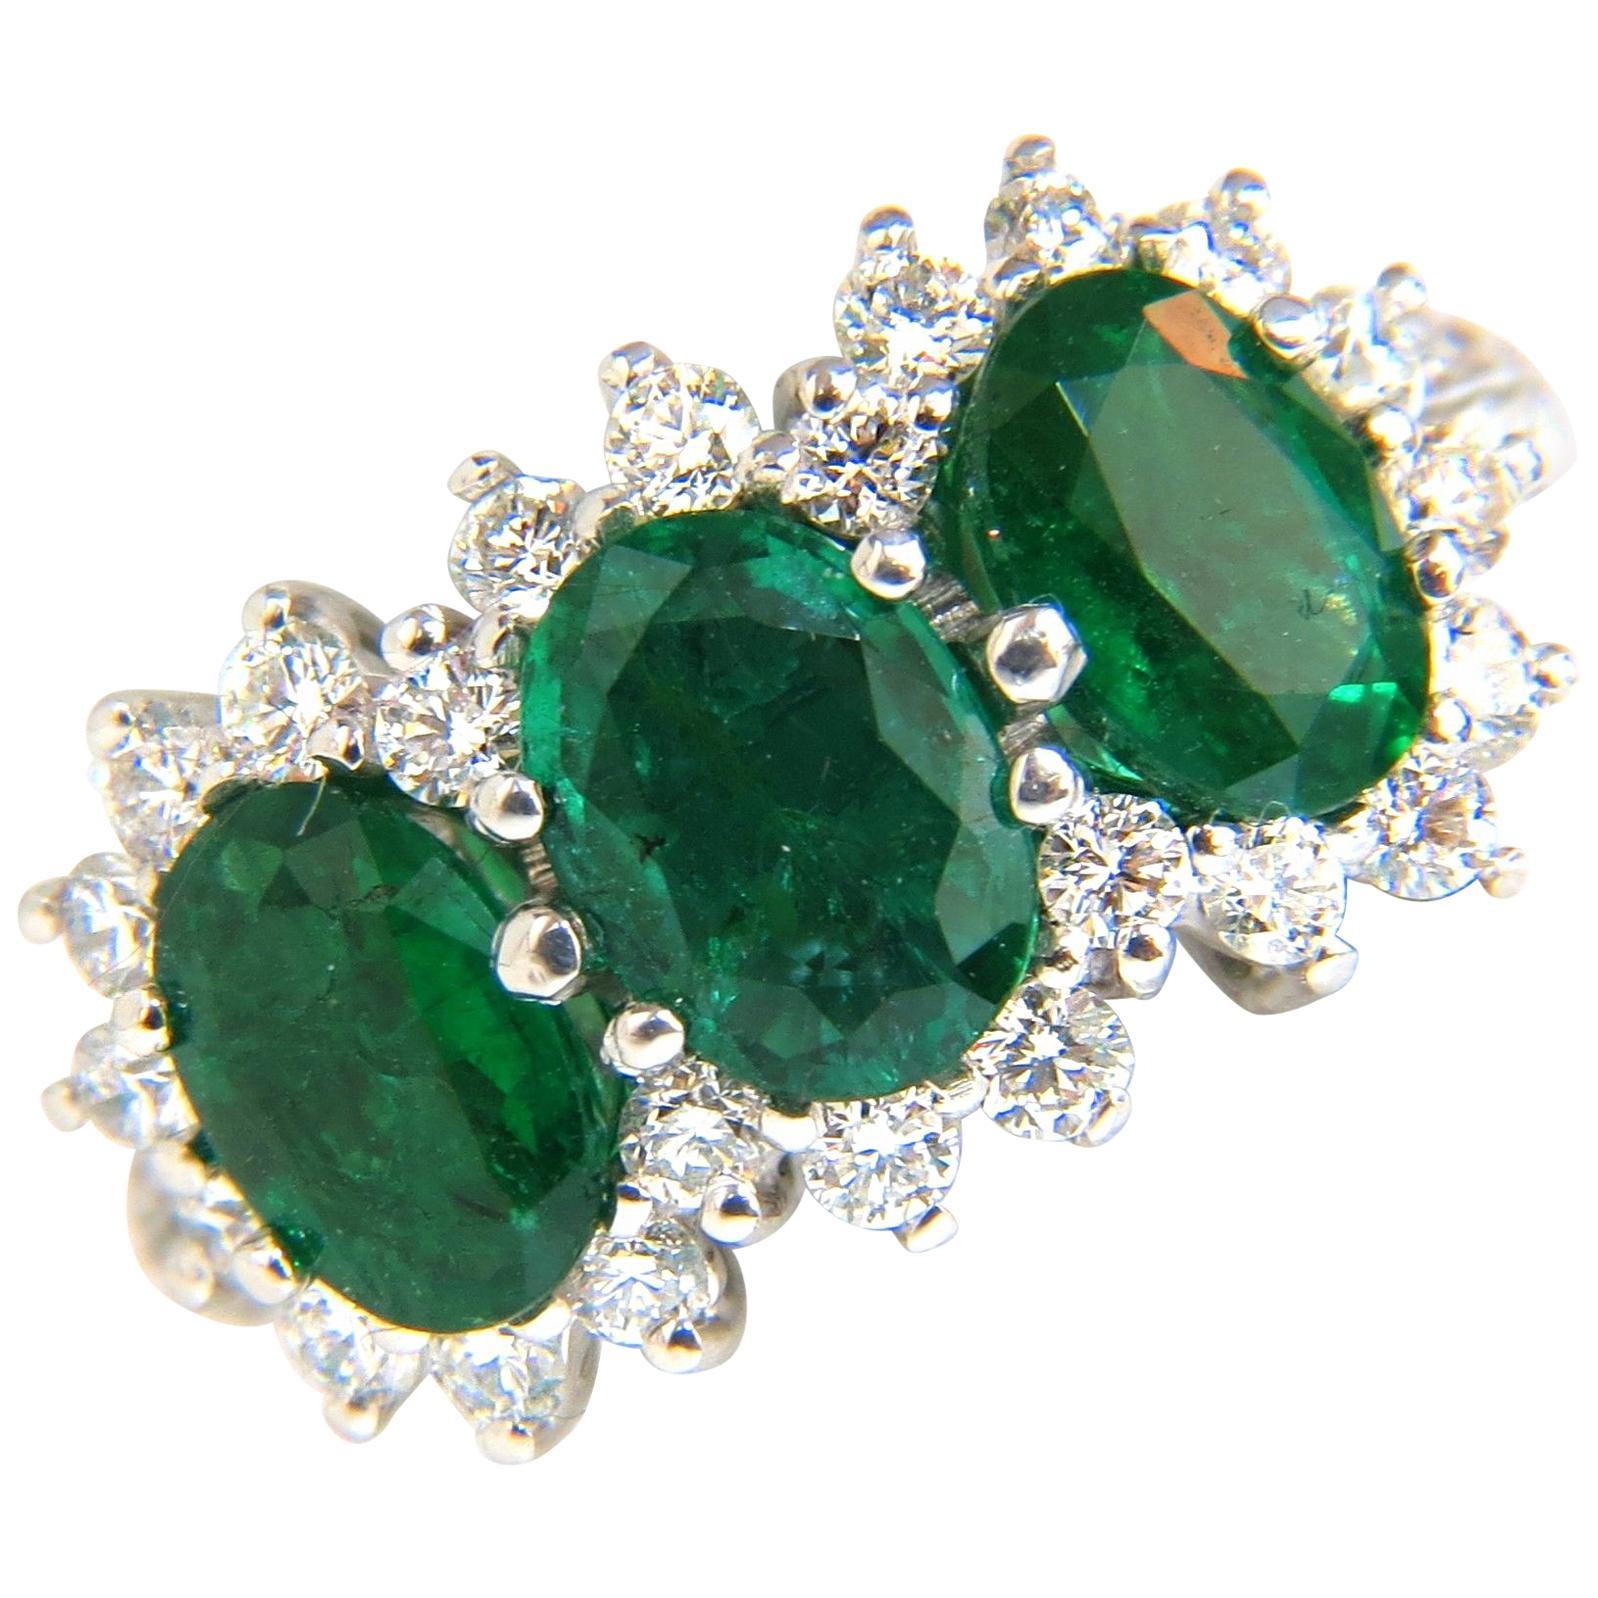 3.47 Carat 18 Karat Natural Vivid Green Emeralds Diamond Ring Cluster Cocktail